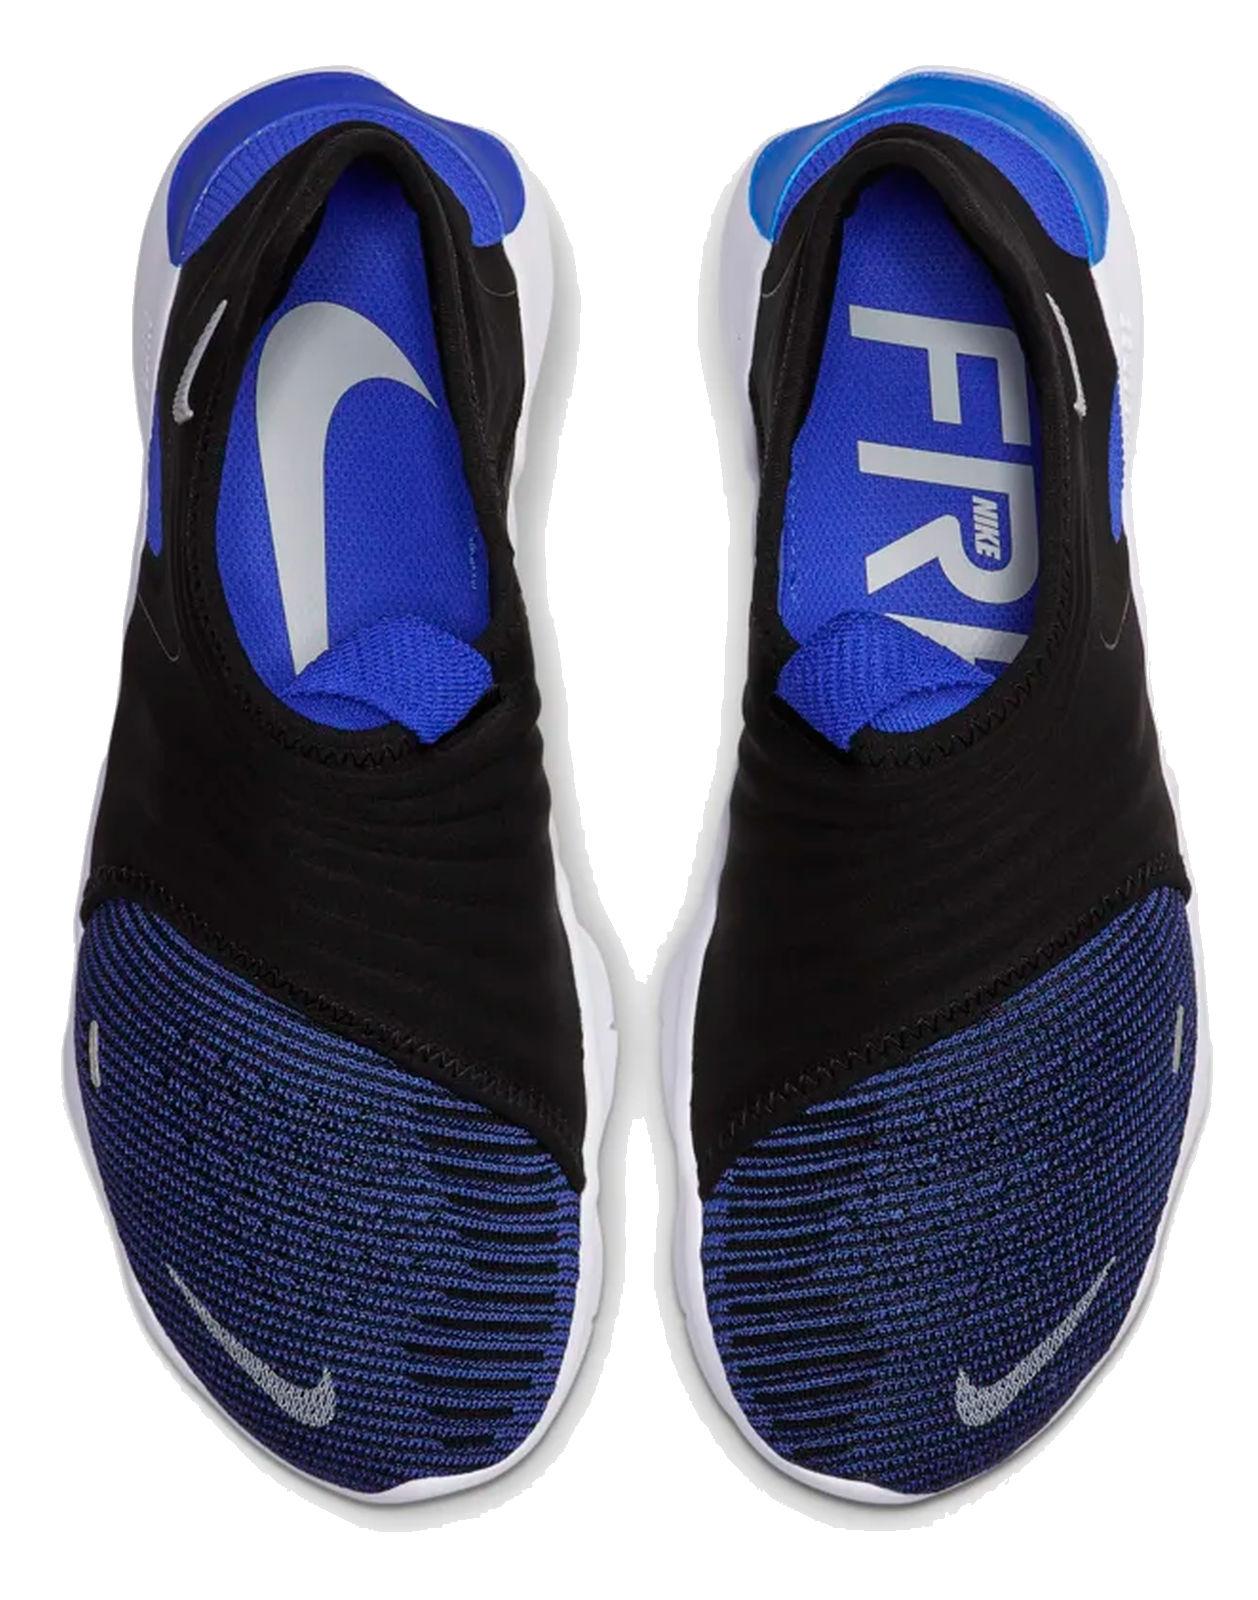 Détails sur Nike Homme Lauf Freizeit Schuhe Baskets Nike Free Rn Flyknit 3.0 Bleu Noir